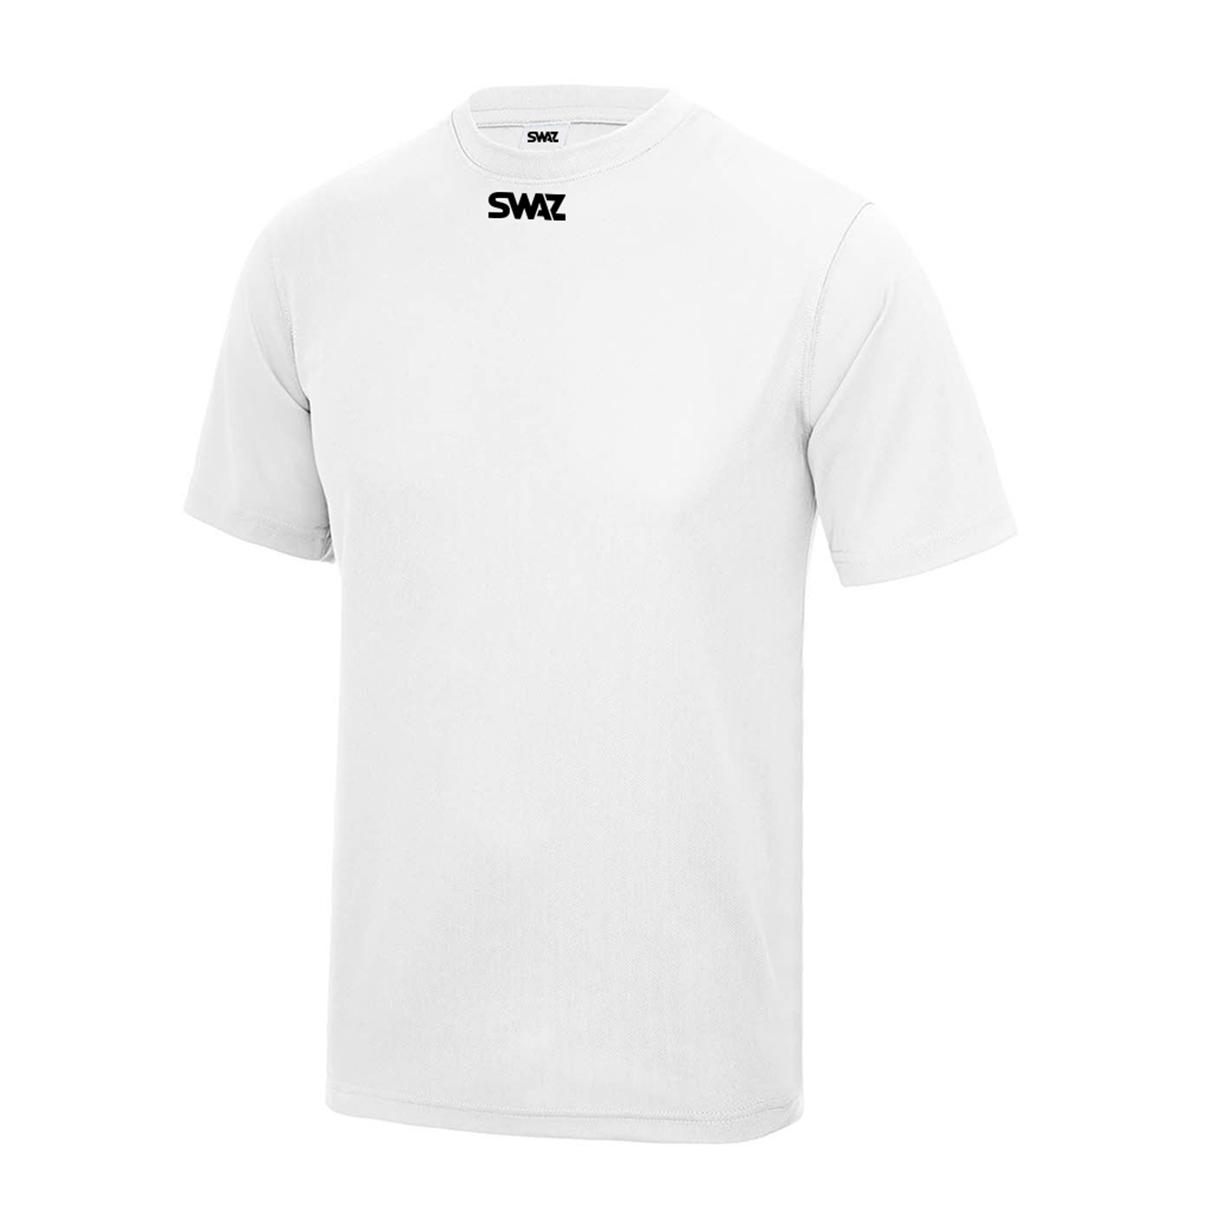 SWAZ Youth Club Training T-Shirt – White